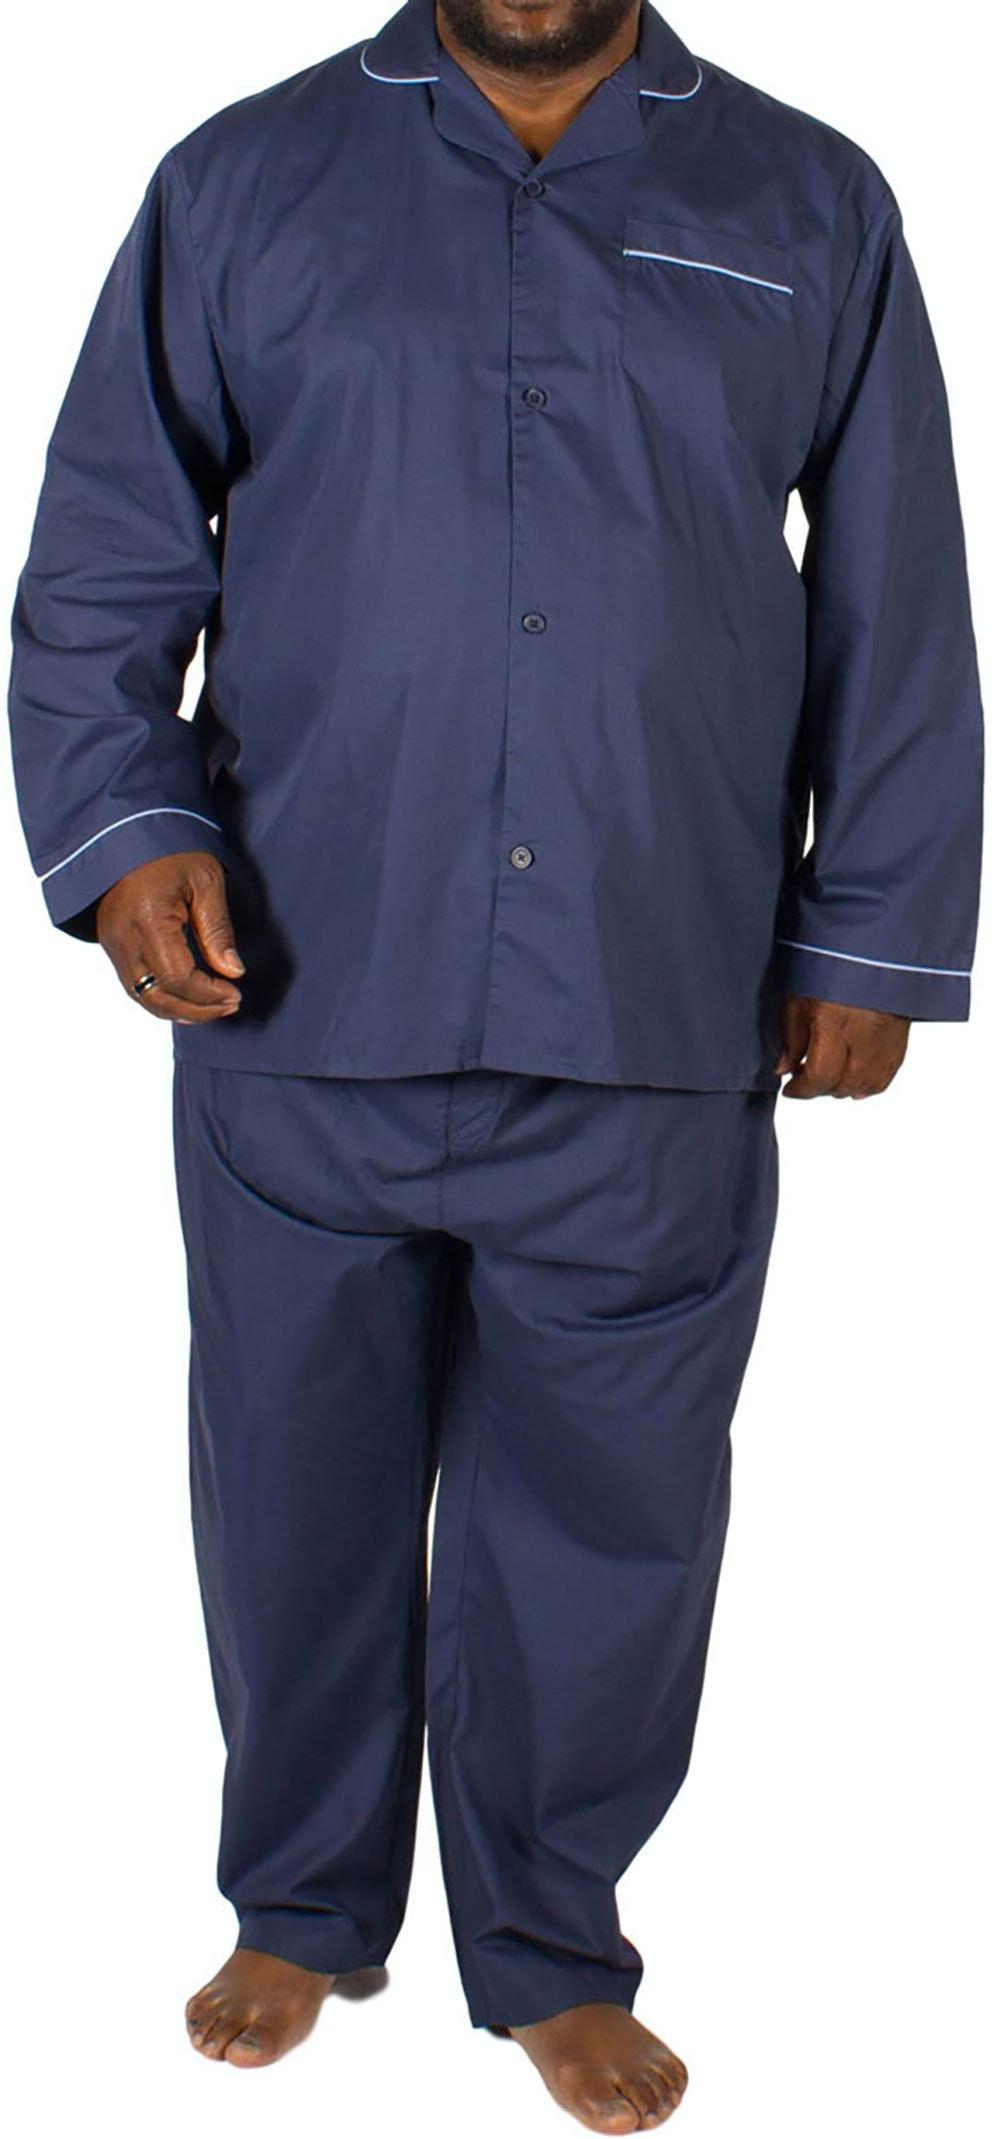 KAM Classic Woven Pyjama Set Navy